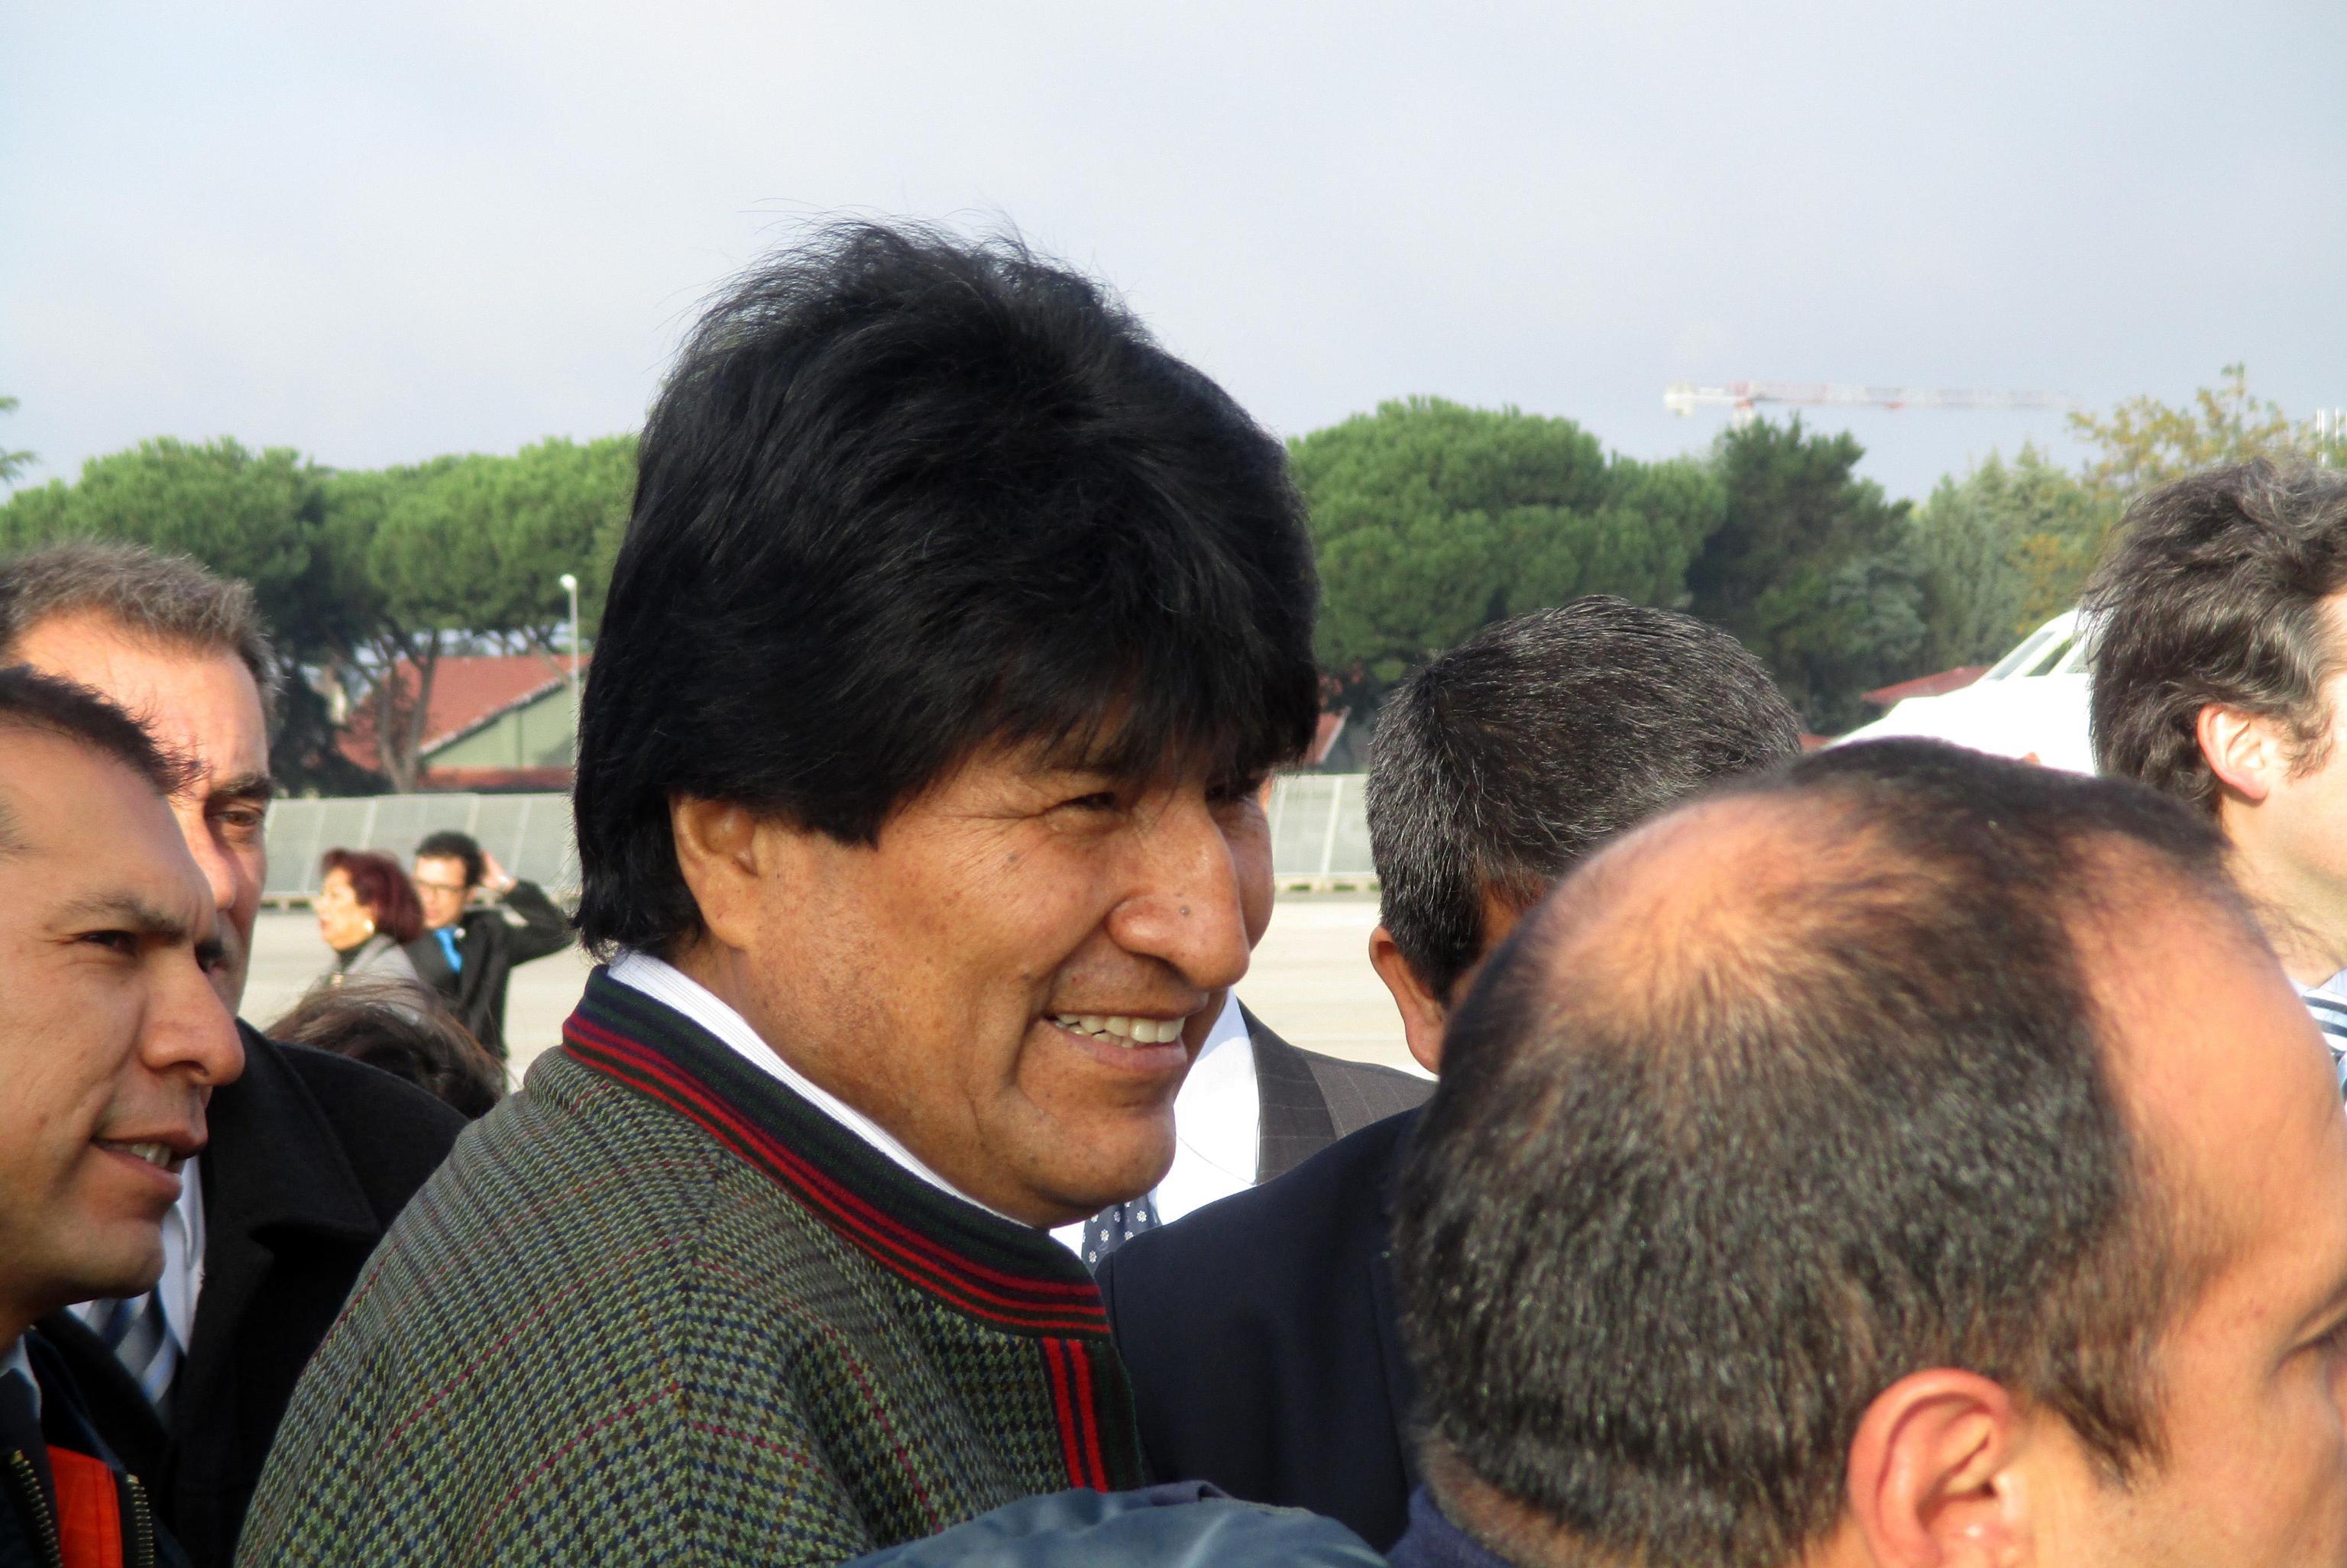 Evo Morales arriving at Rome. Airport of Ciampino - 6 November 2015